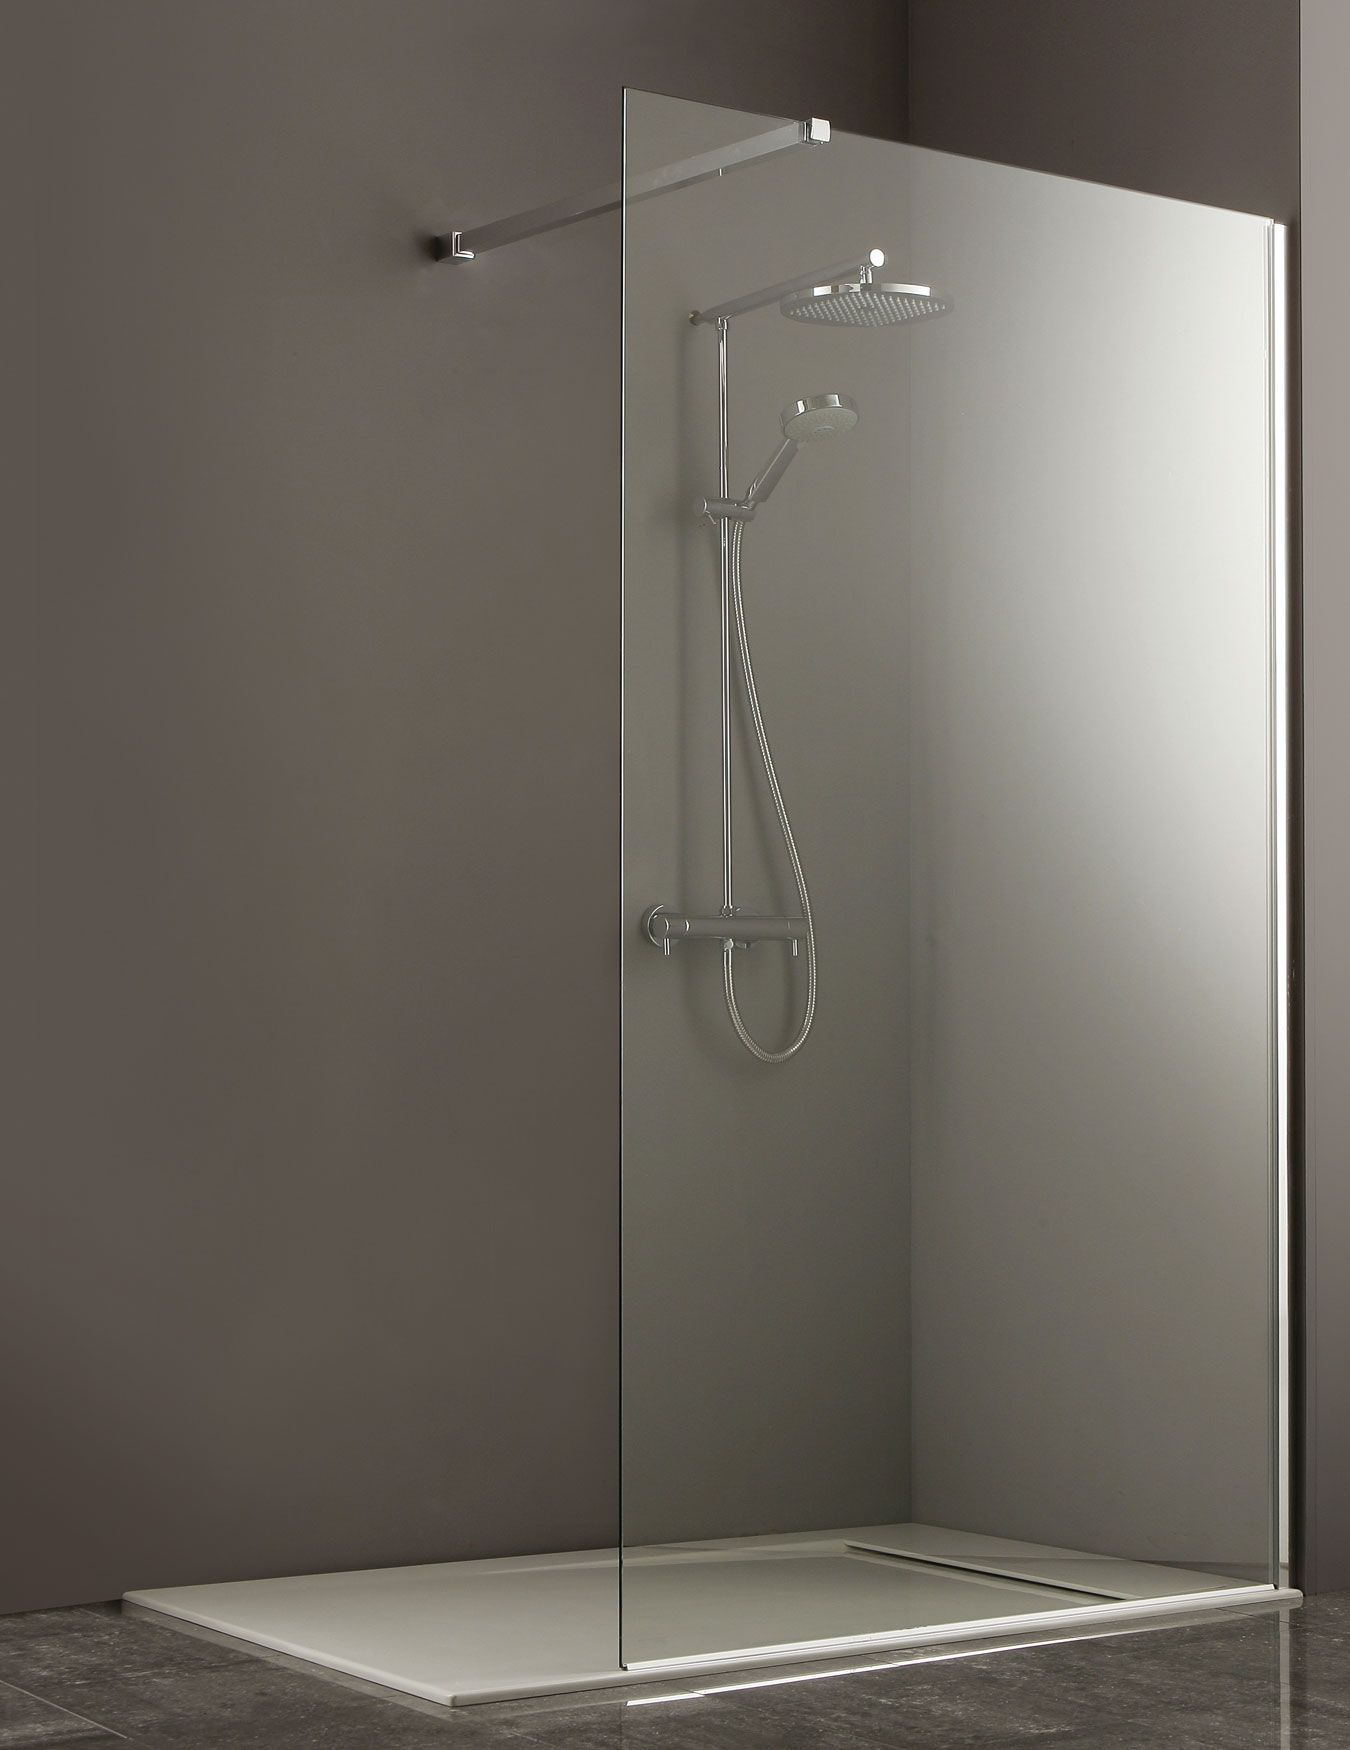 designer bathromms, glass walls - Iskanje Google | bath | Pinterest ...